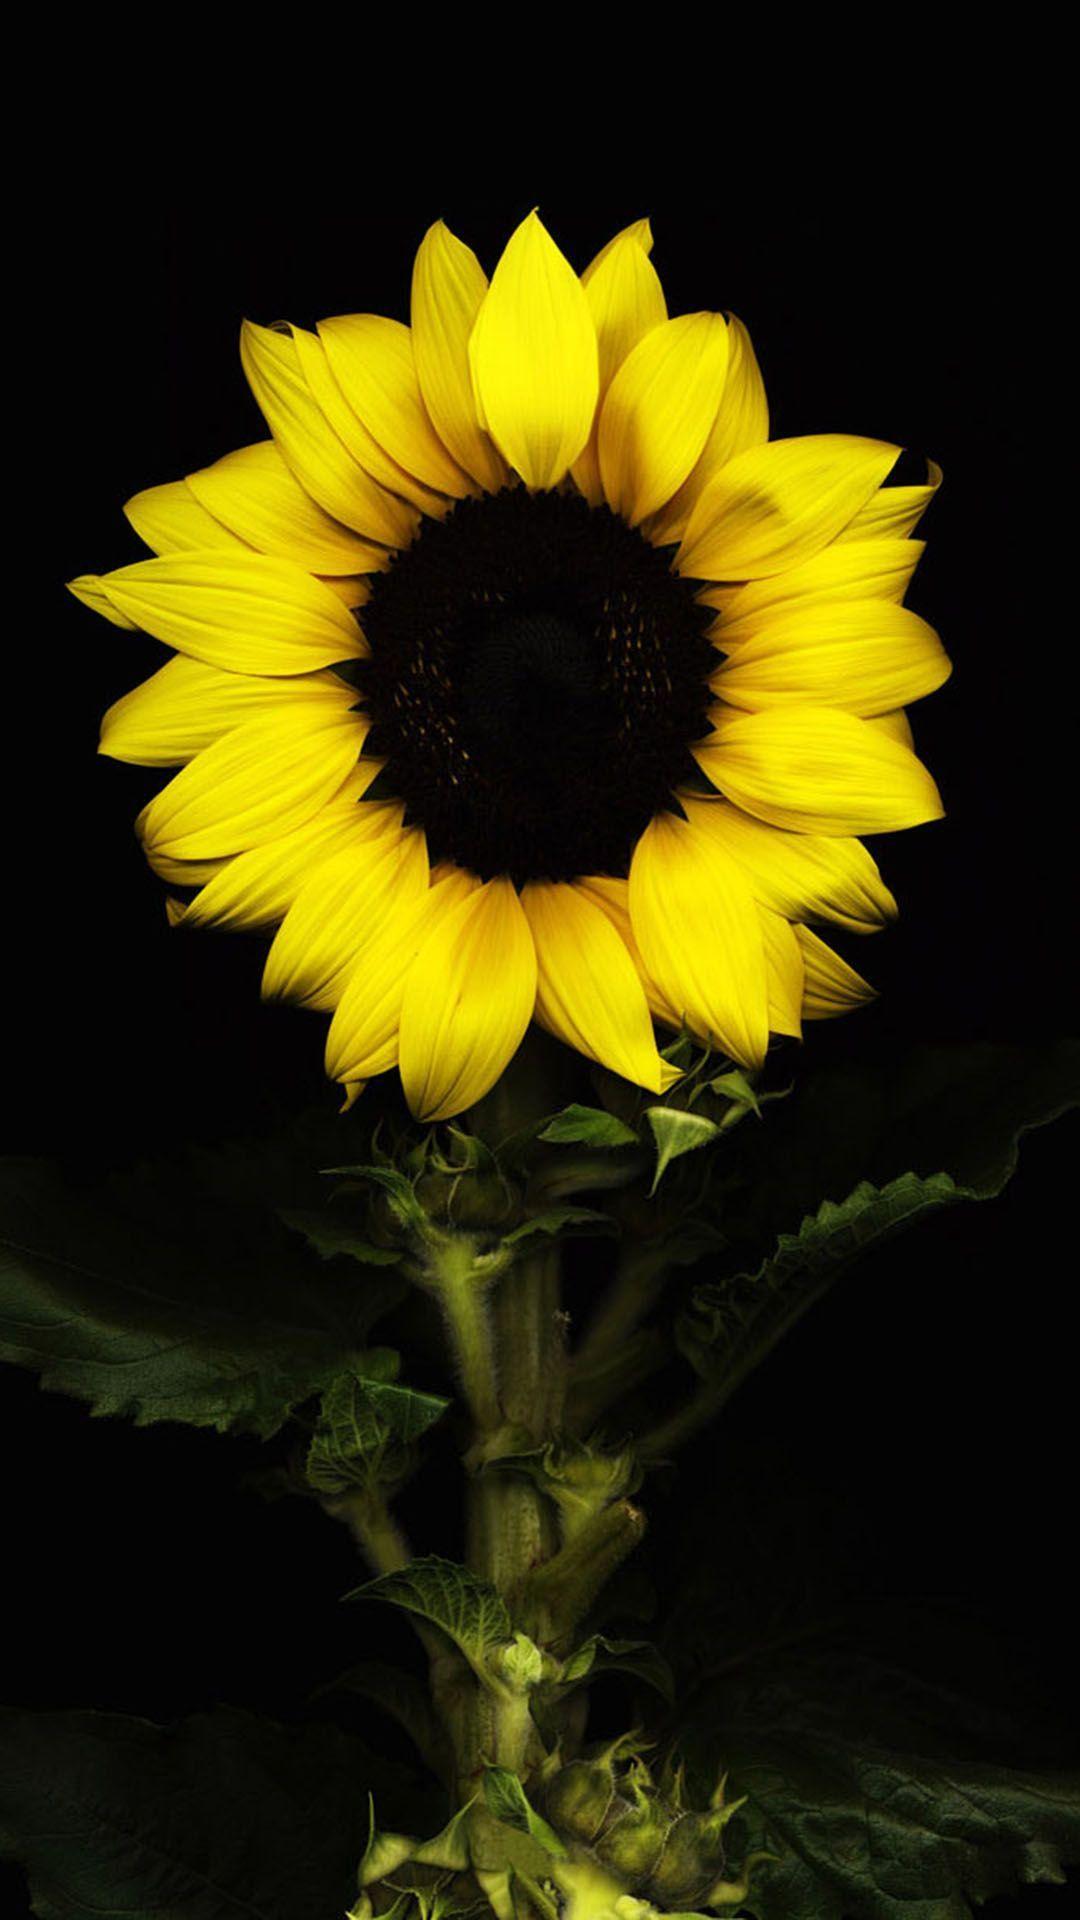 Black Sunflower Wallpapers Top Free Black Sunflower Backgrounds Wallpaperaccess